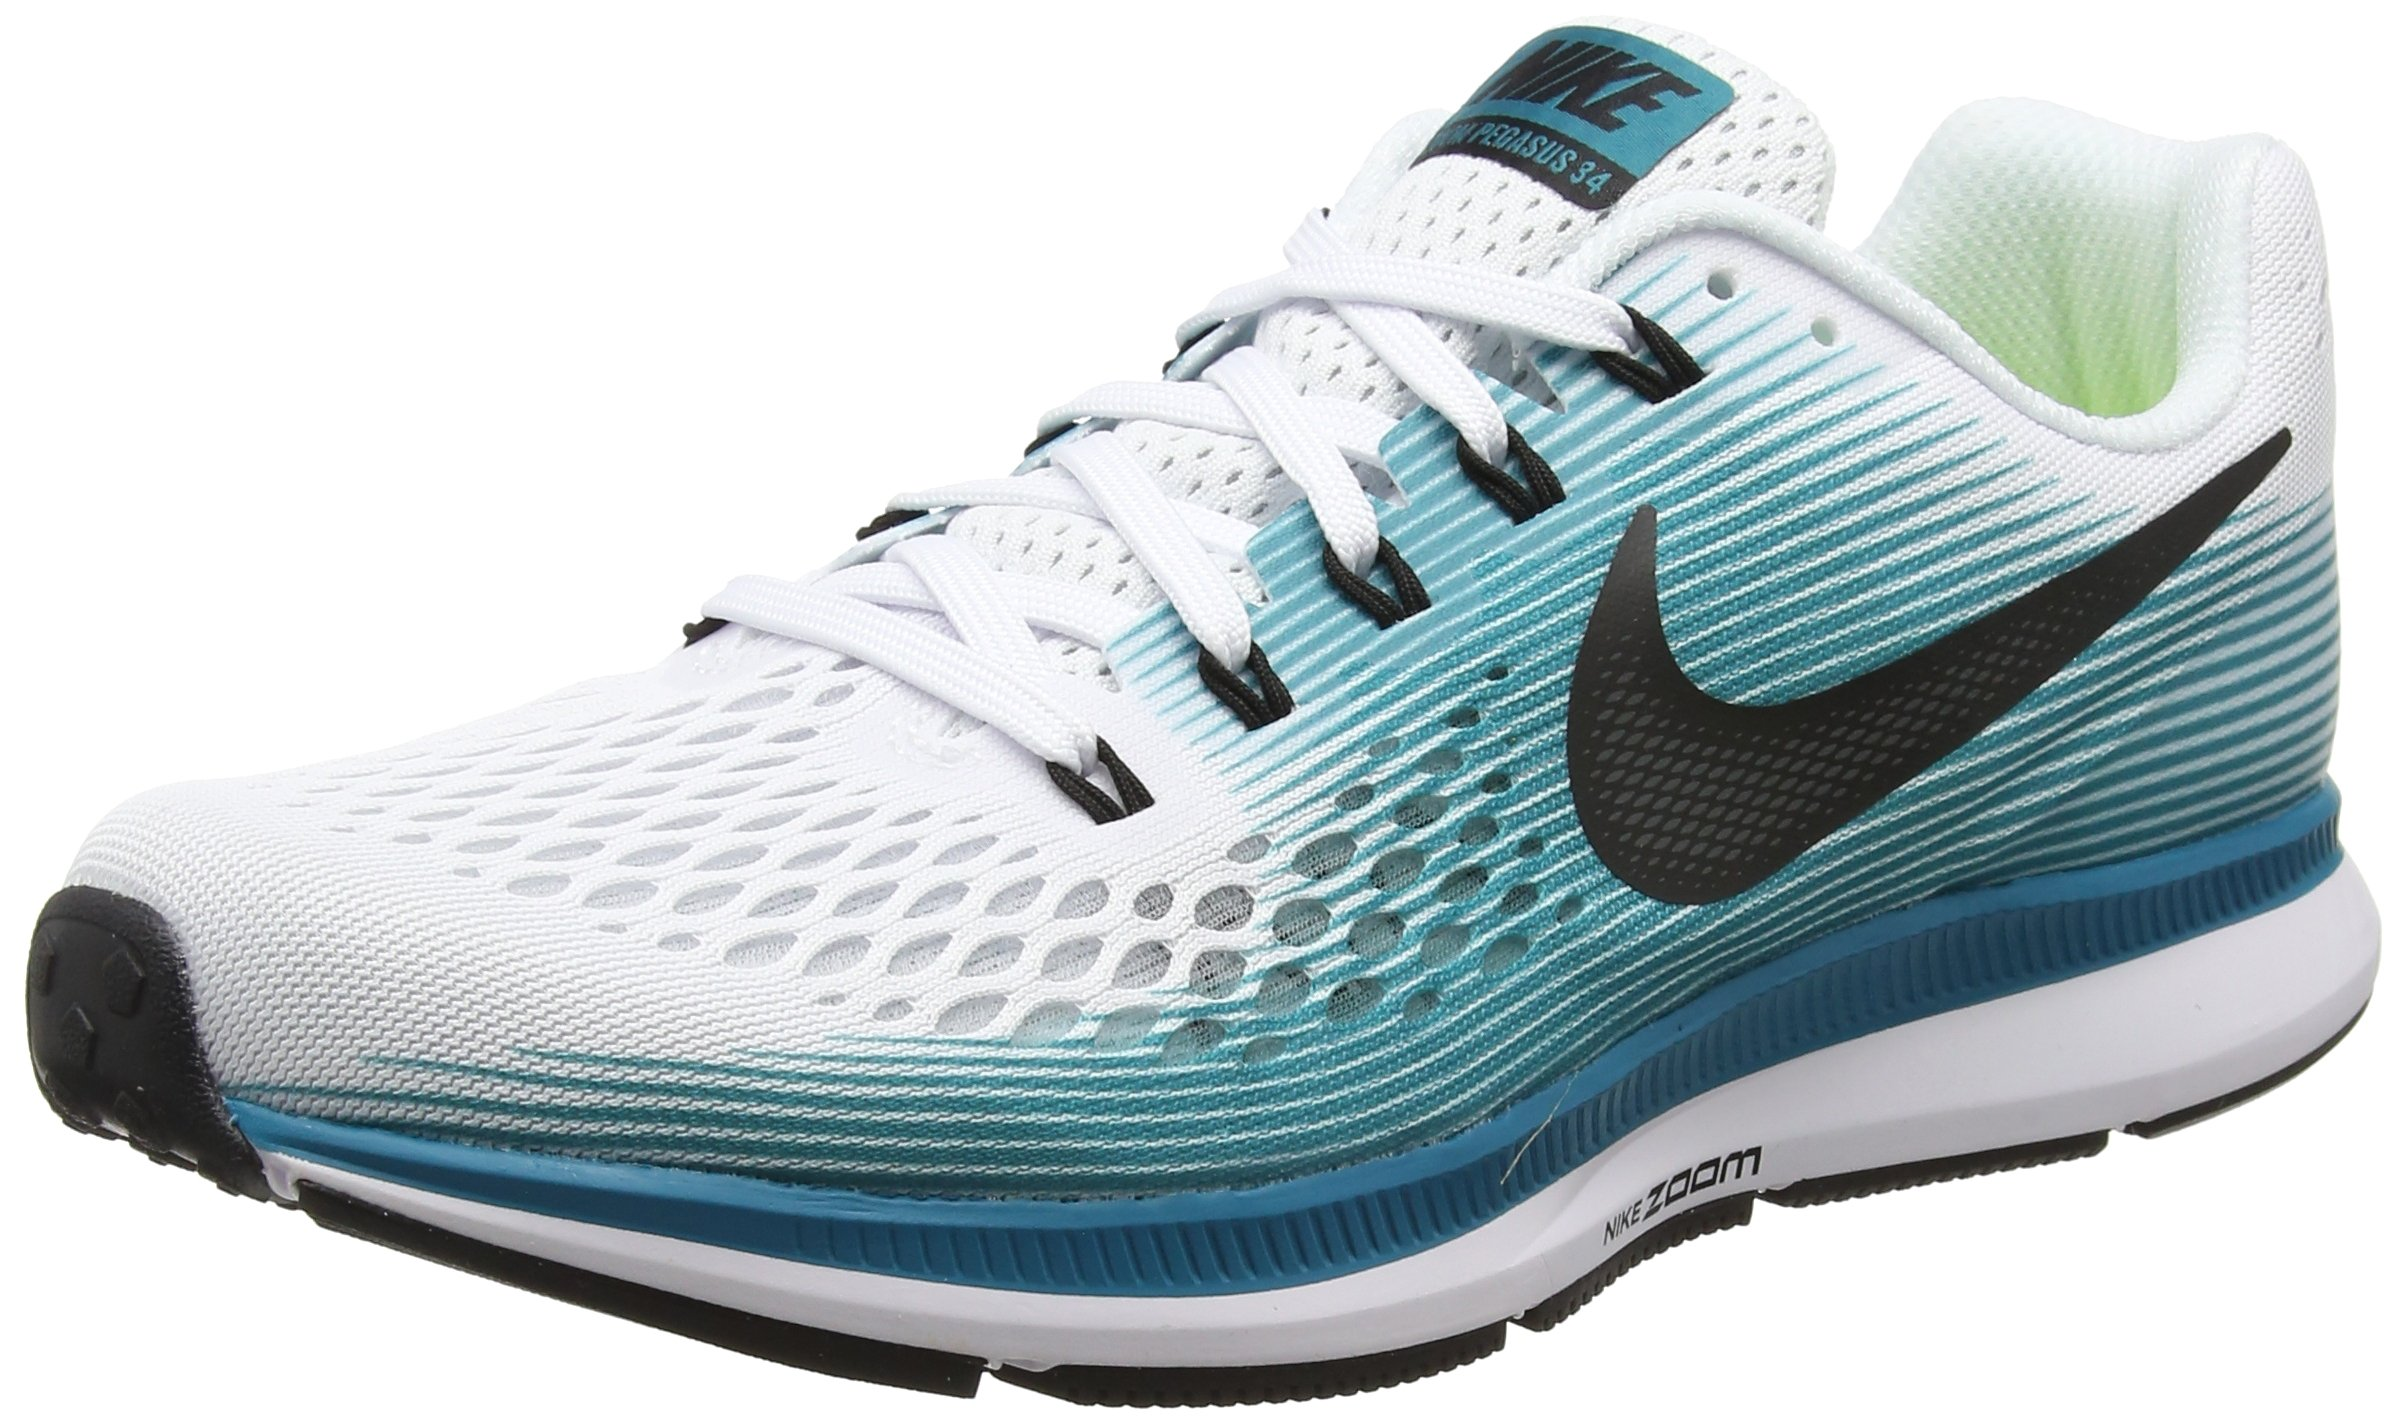 Nike Men's Air Zoom Pegasus 34 White / Black - Blustery 880555-101 (11.5) by NIKE (Image #1)